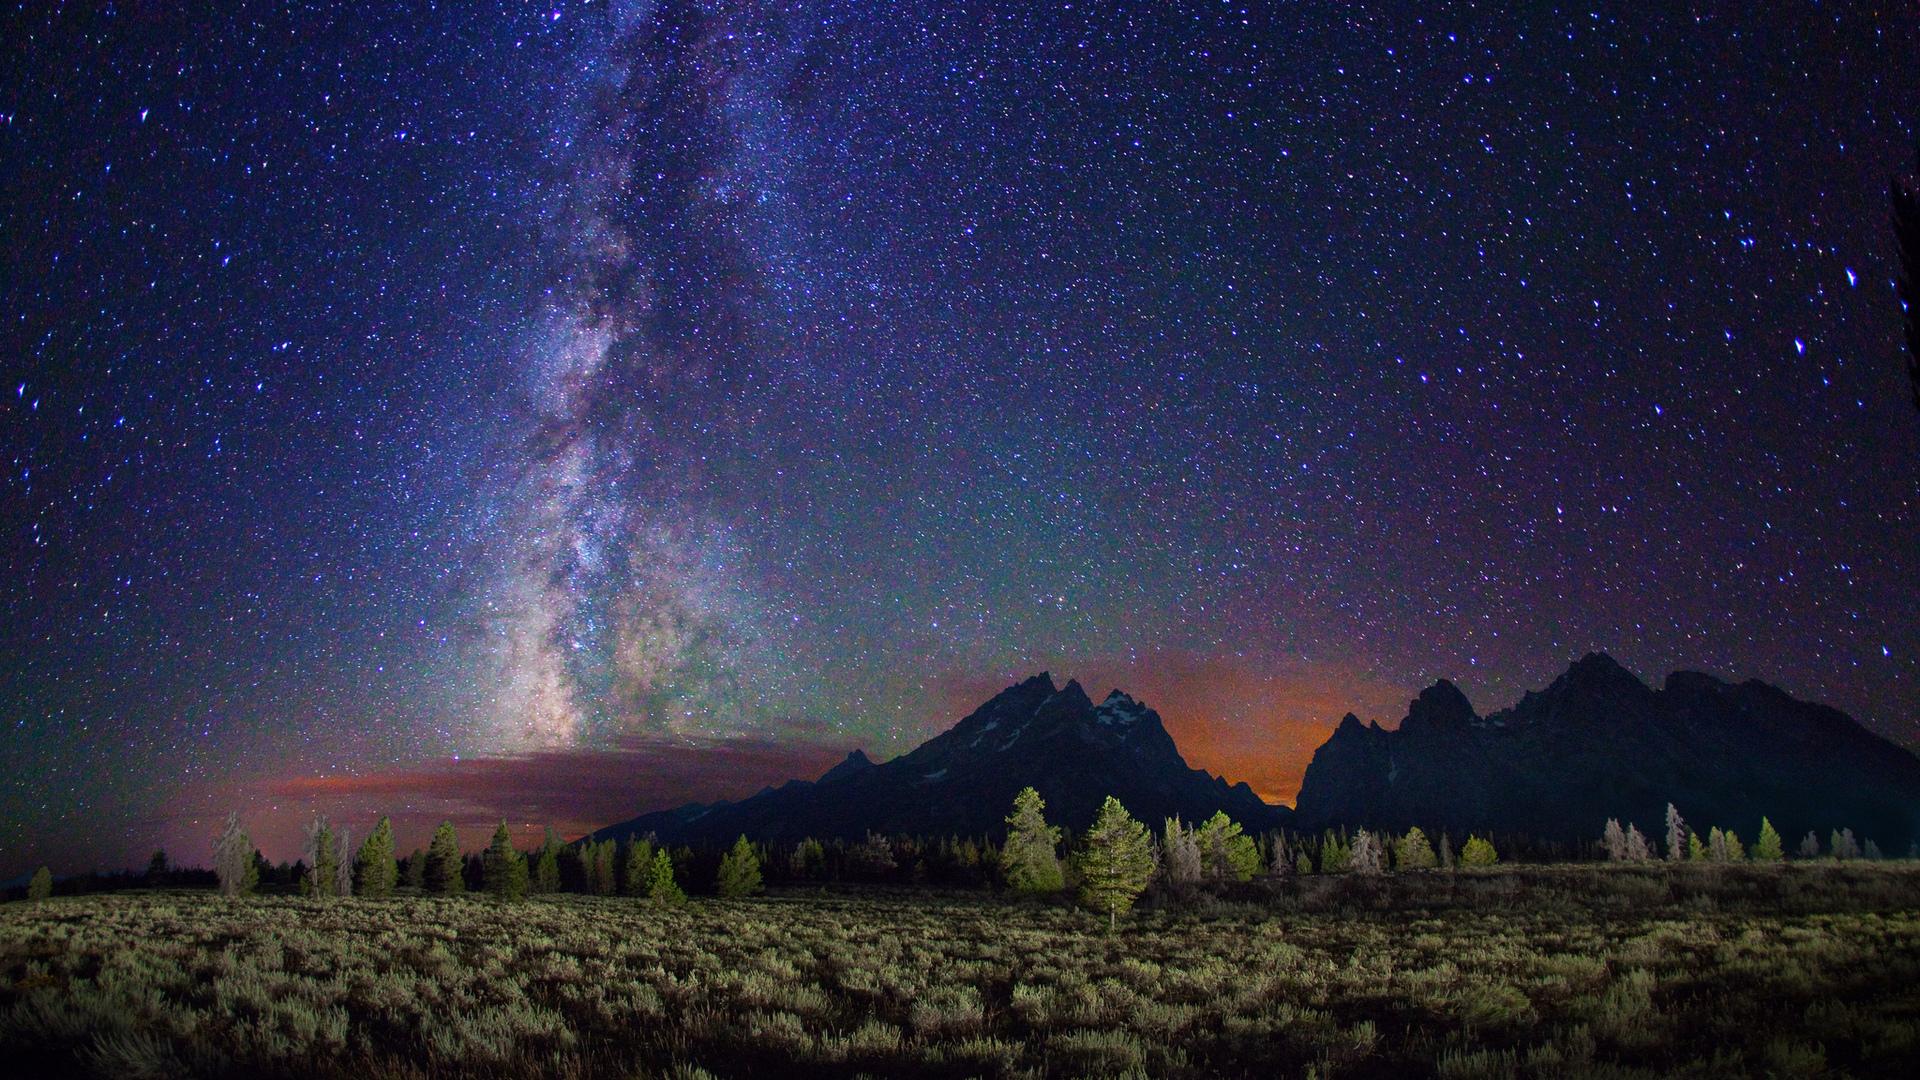 Milky Way sky wallpaper background 1920x1080